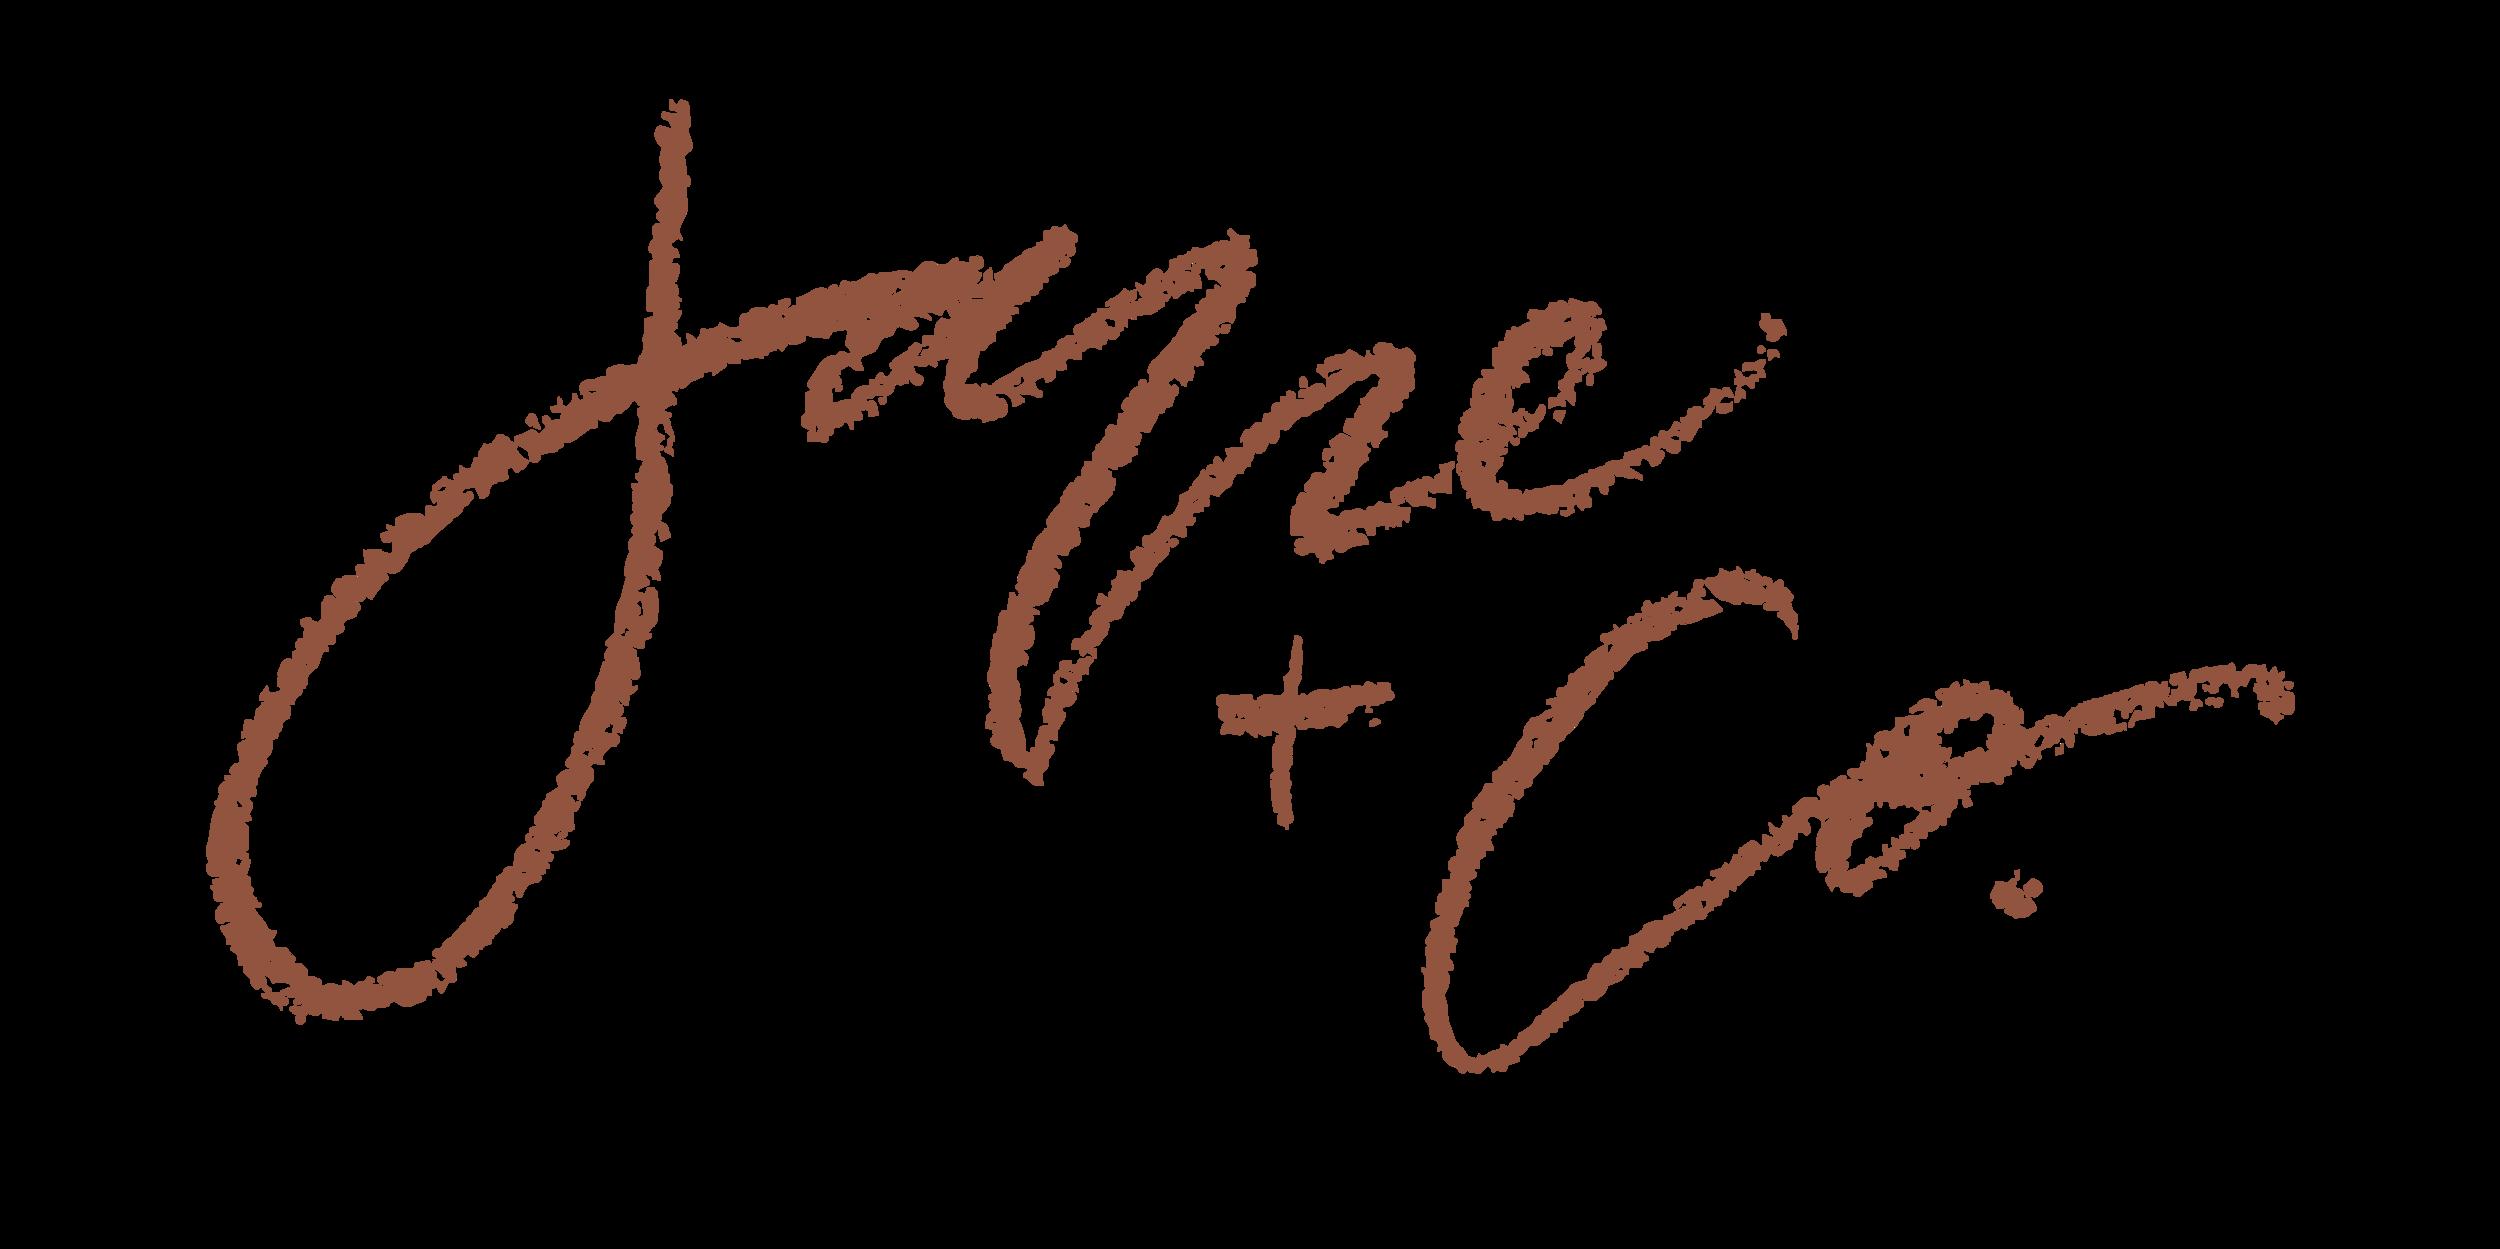 jane + co logo-1.png